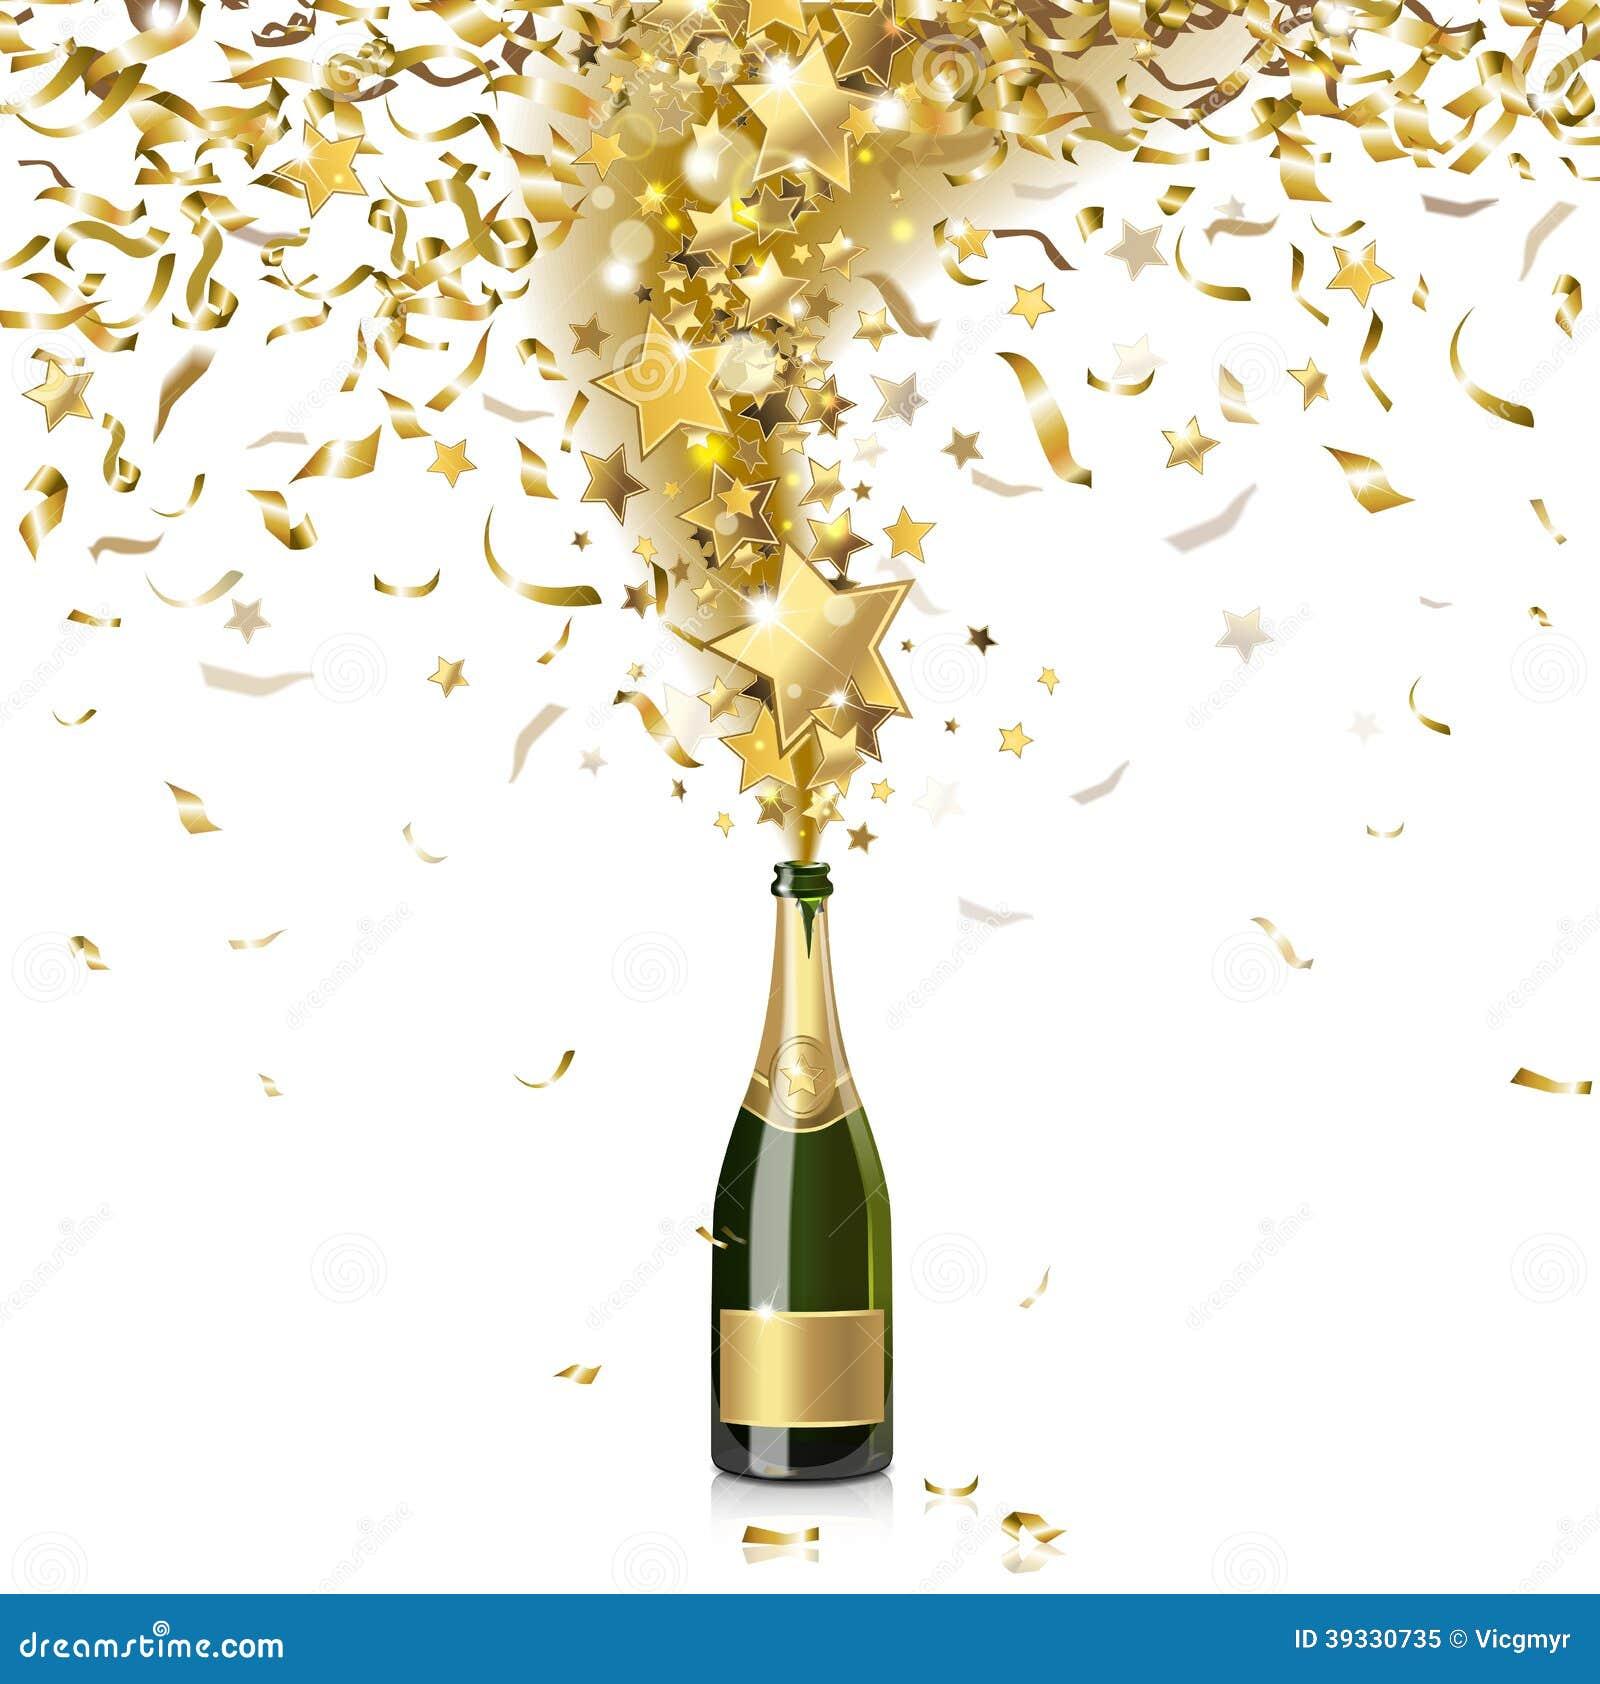 Festive Champagne Stock Vector - Image: 39330735